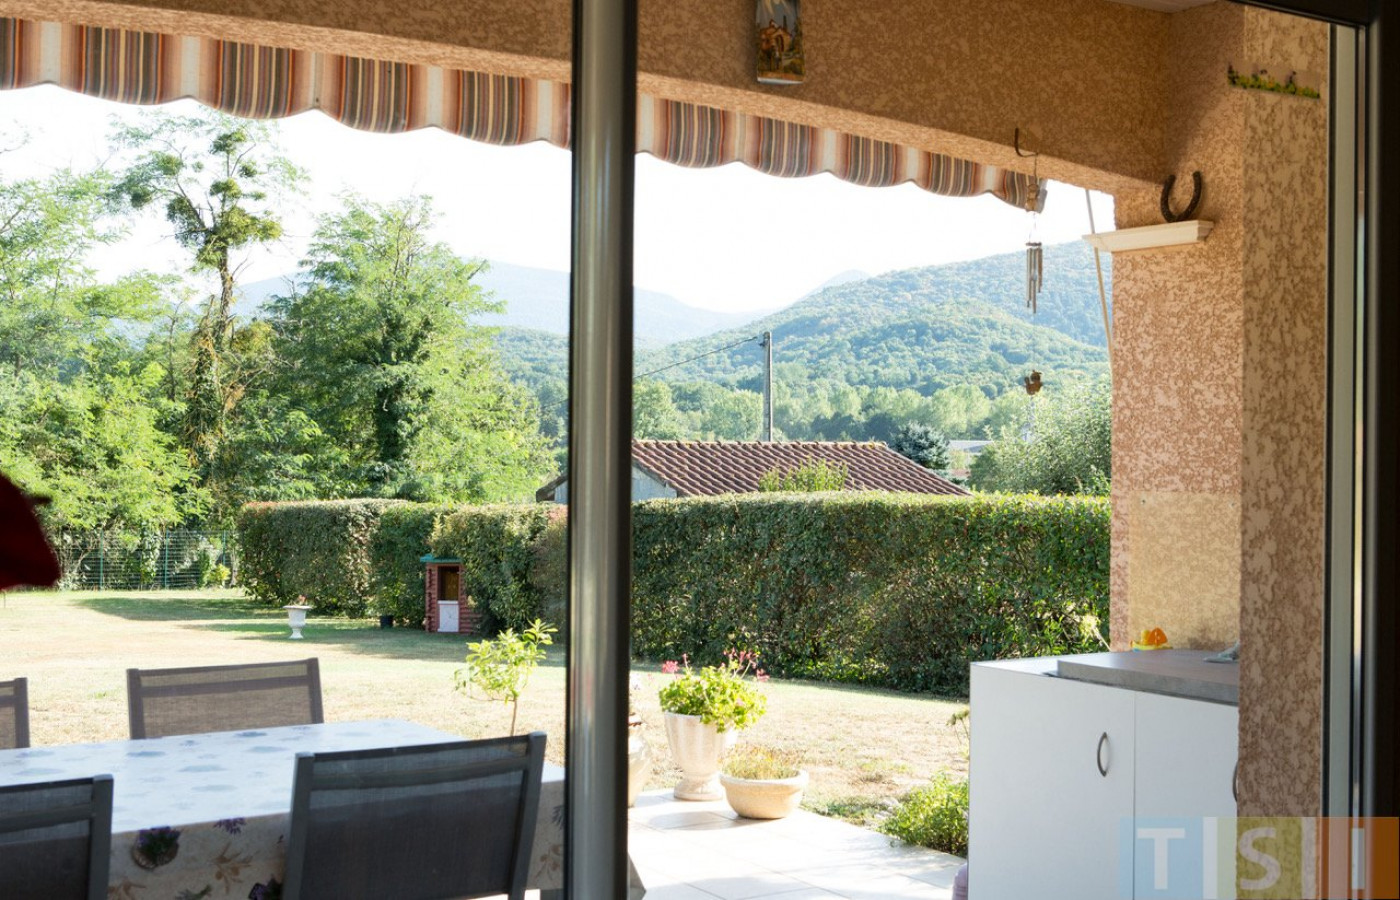 A vendre  Montrejeau | Réf 3119052148 - Tsi mont royal